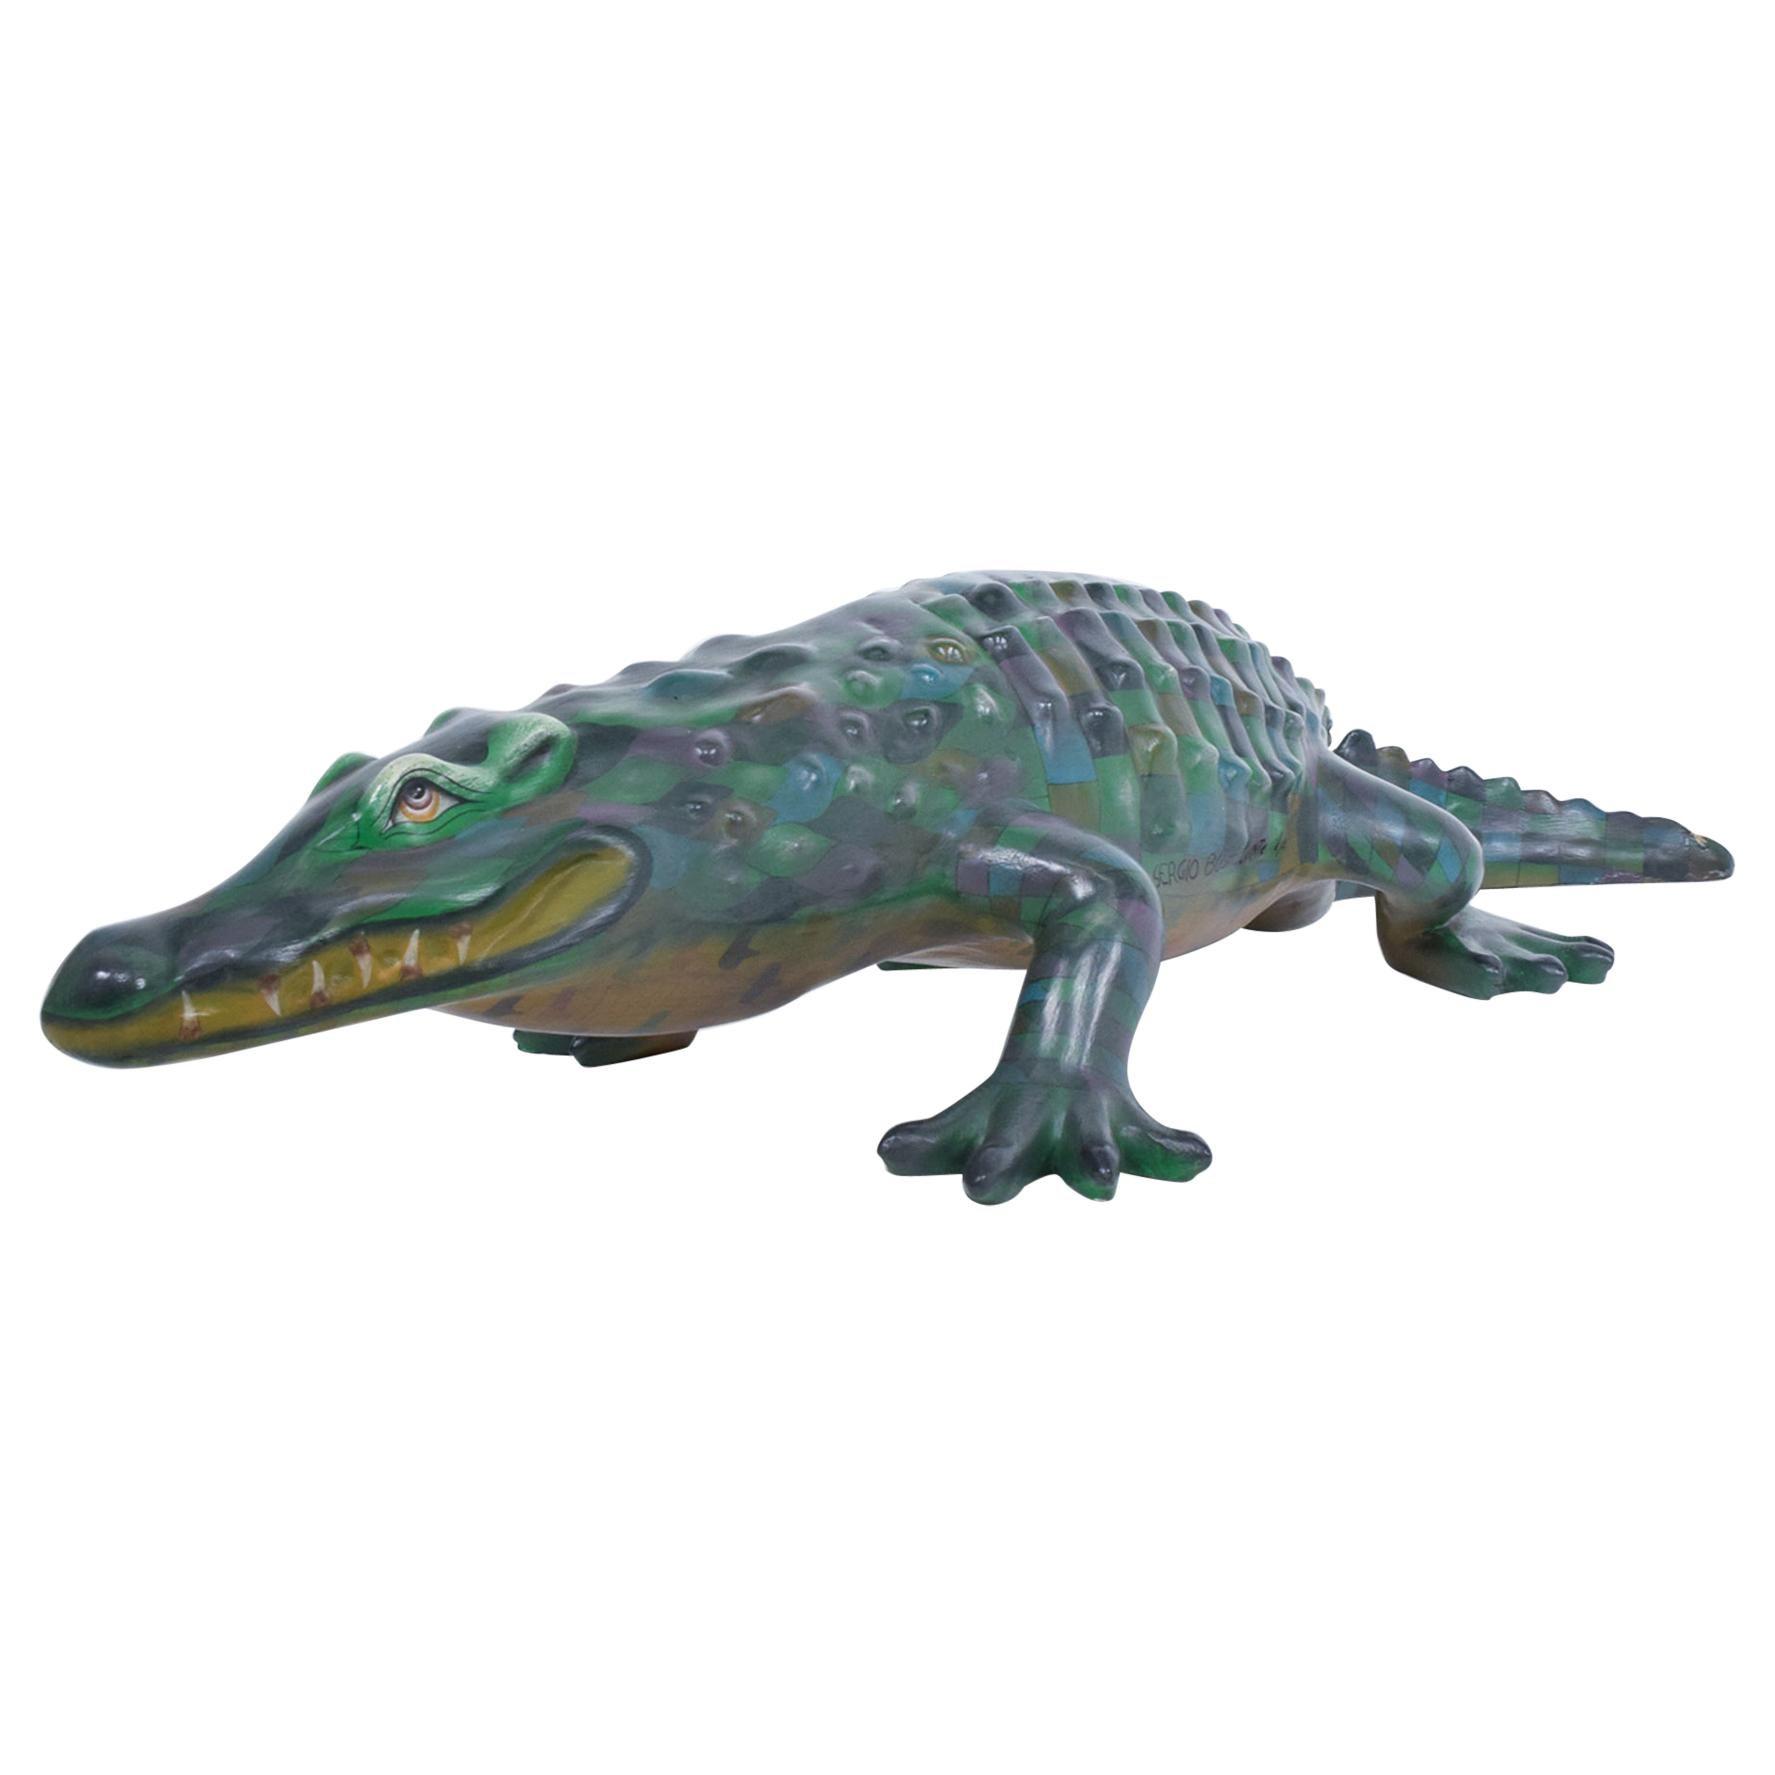 Sergio Bustamante Paper Mâché Colorful Crocodile Sculpture Mexico 1970s